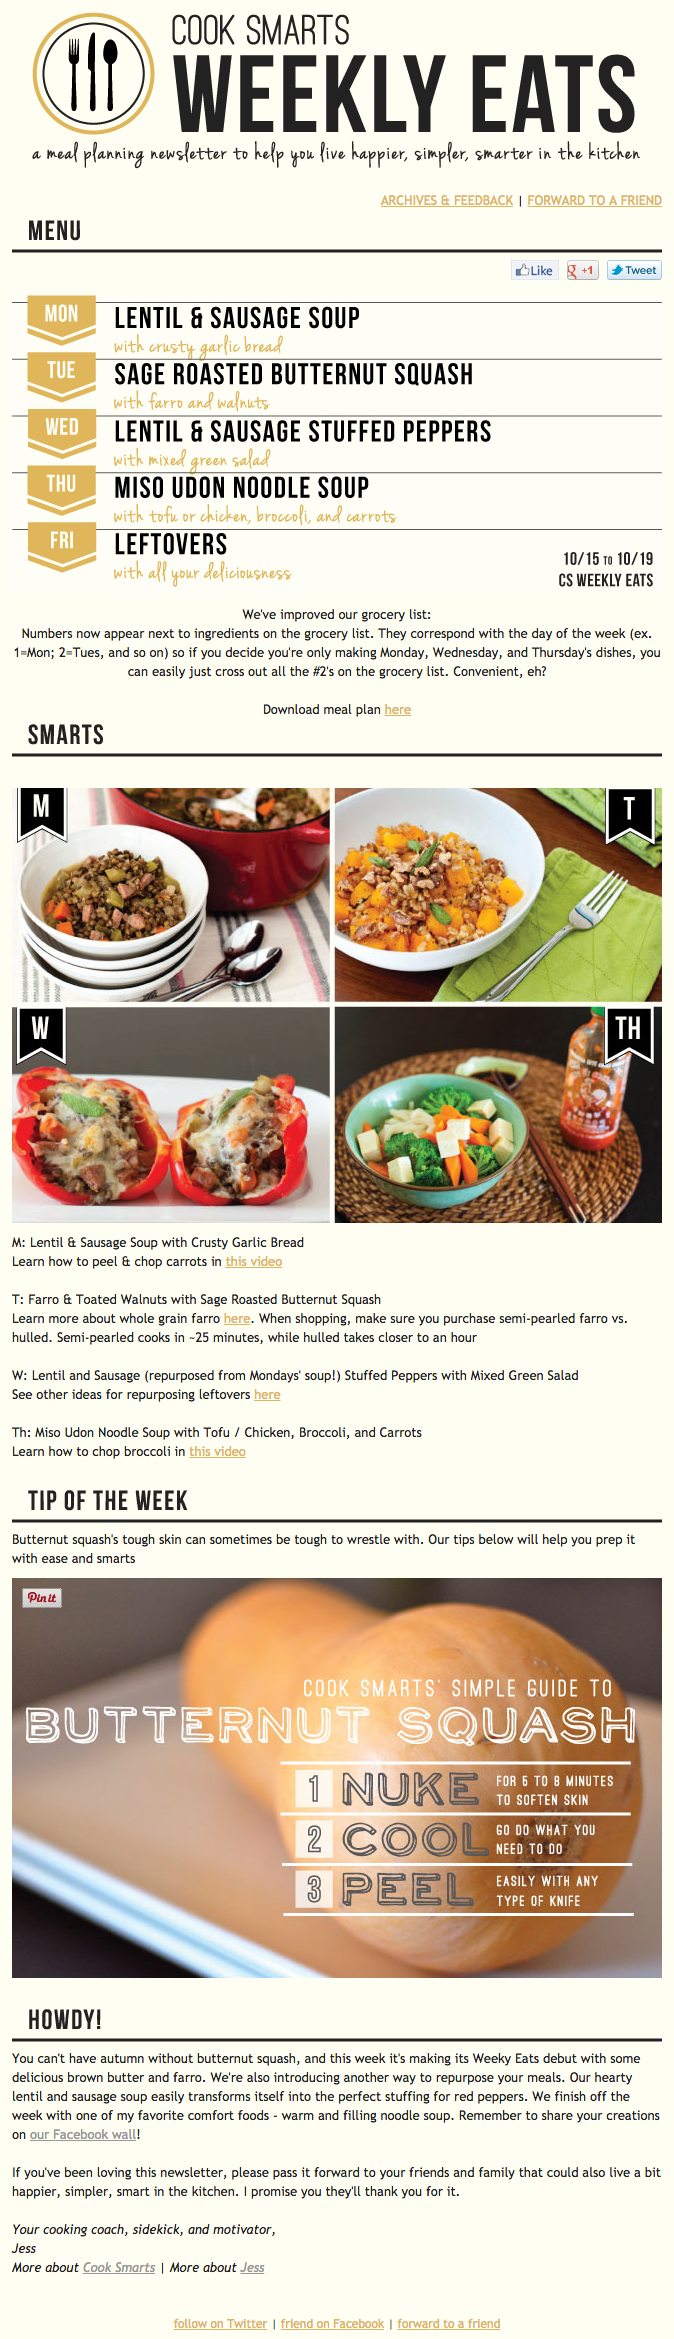 Cook Smartsの綺麗なデザインのメールの実例